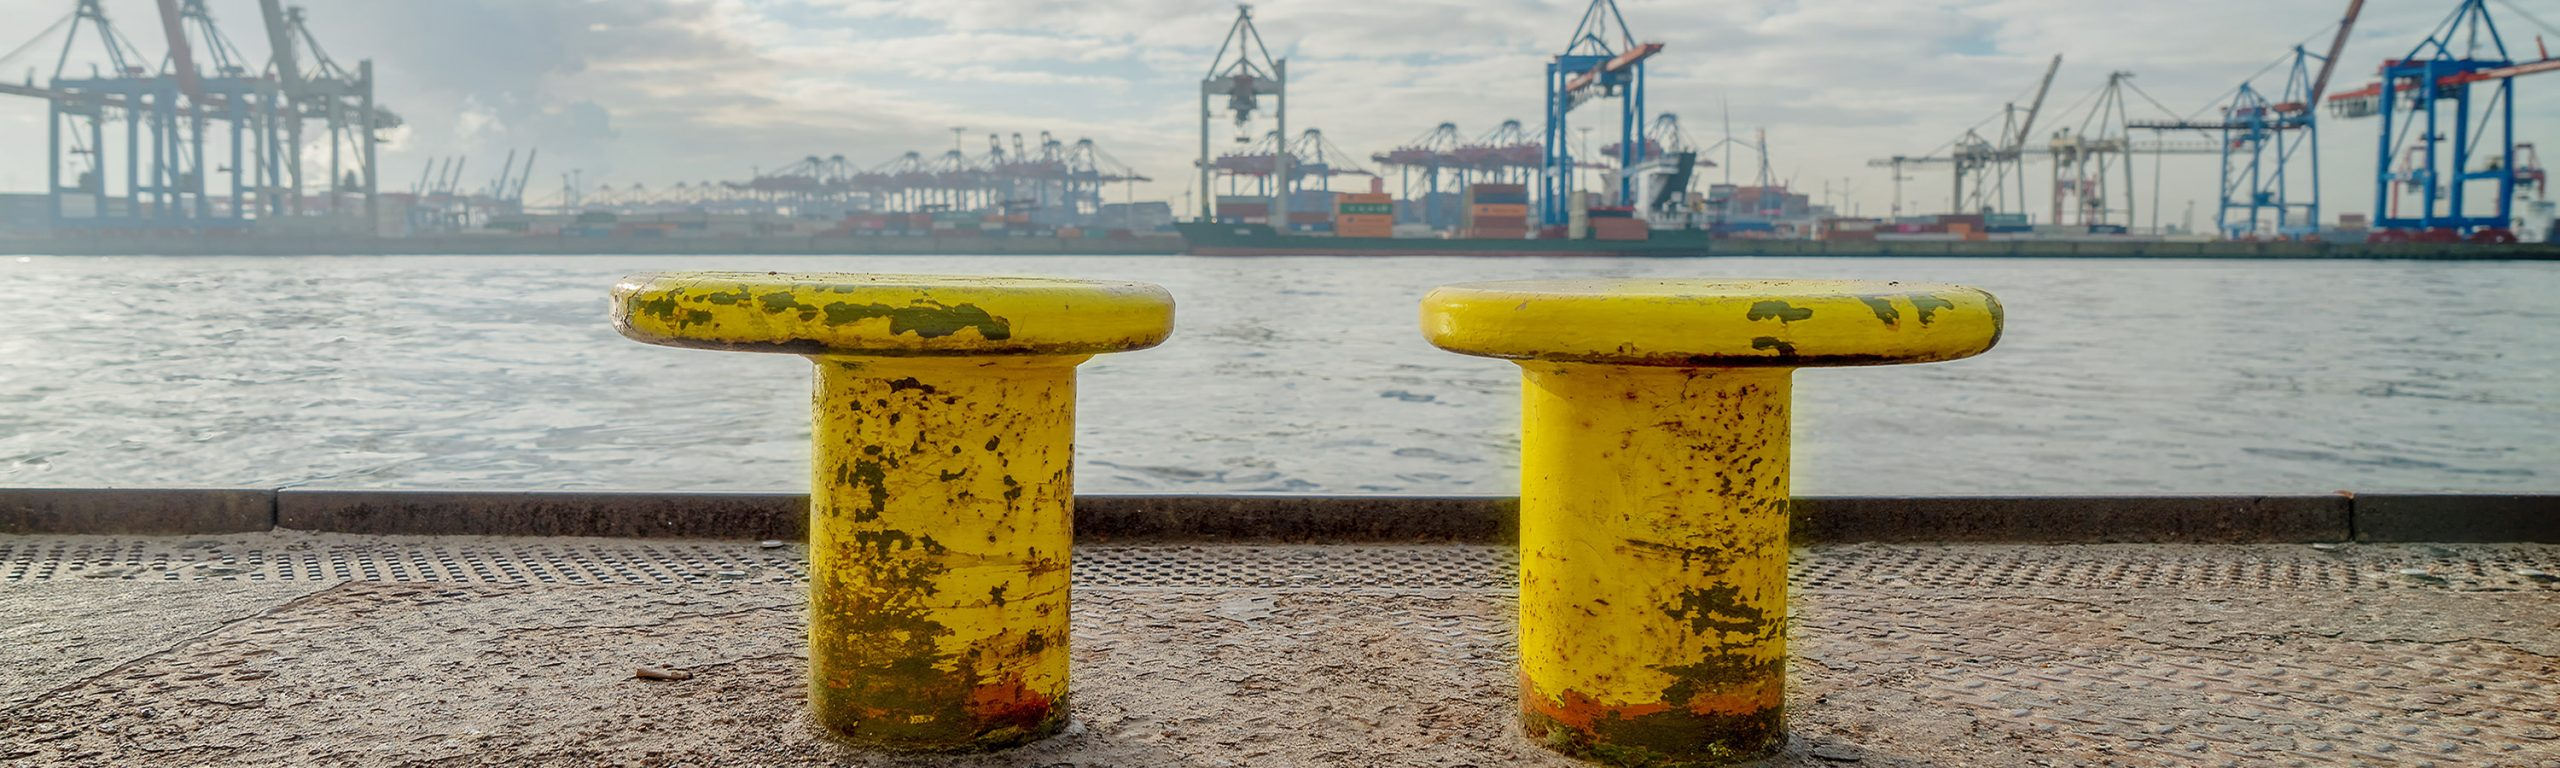 Jürgensen Steuerberatungsgesellschaft mbH Hamburg